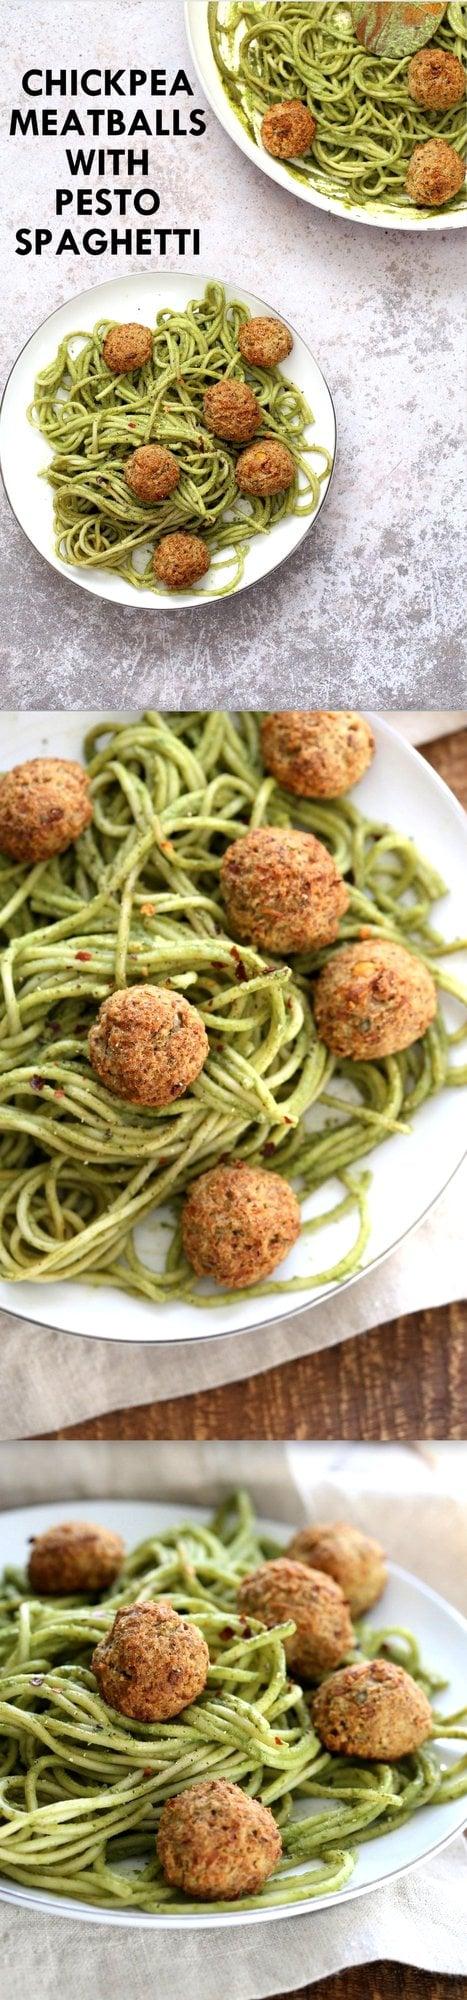 "AmazingPesto Spaghetti with Vegan Meatballs made with Chickpeas. 24 Gm of Protein per Serve. Vegetarian Chickpea Walnut ""meatballs"" over pesto pasta. Ready in 40 Minutes. Vegan Soyfree Recipe. Can be Glutenfree | VeganRicha.com"